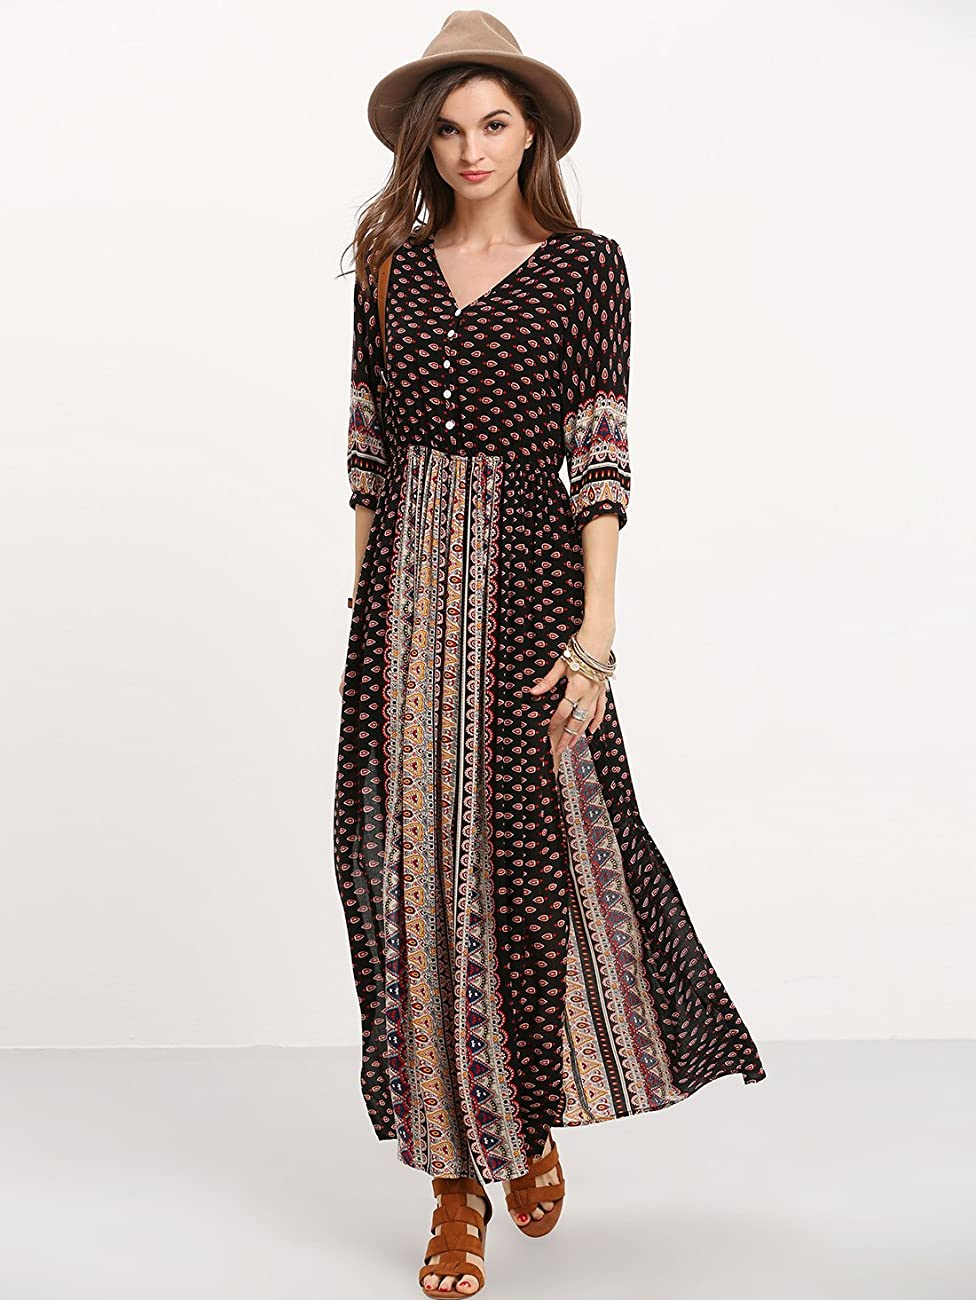 ROMWE Women's Summer Casual Half Sleeve Vintage Print Split Maxi Dress 2